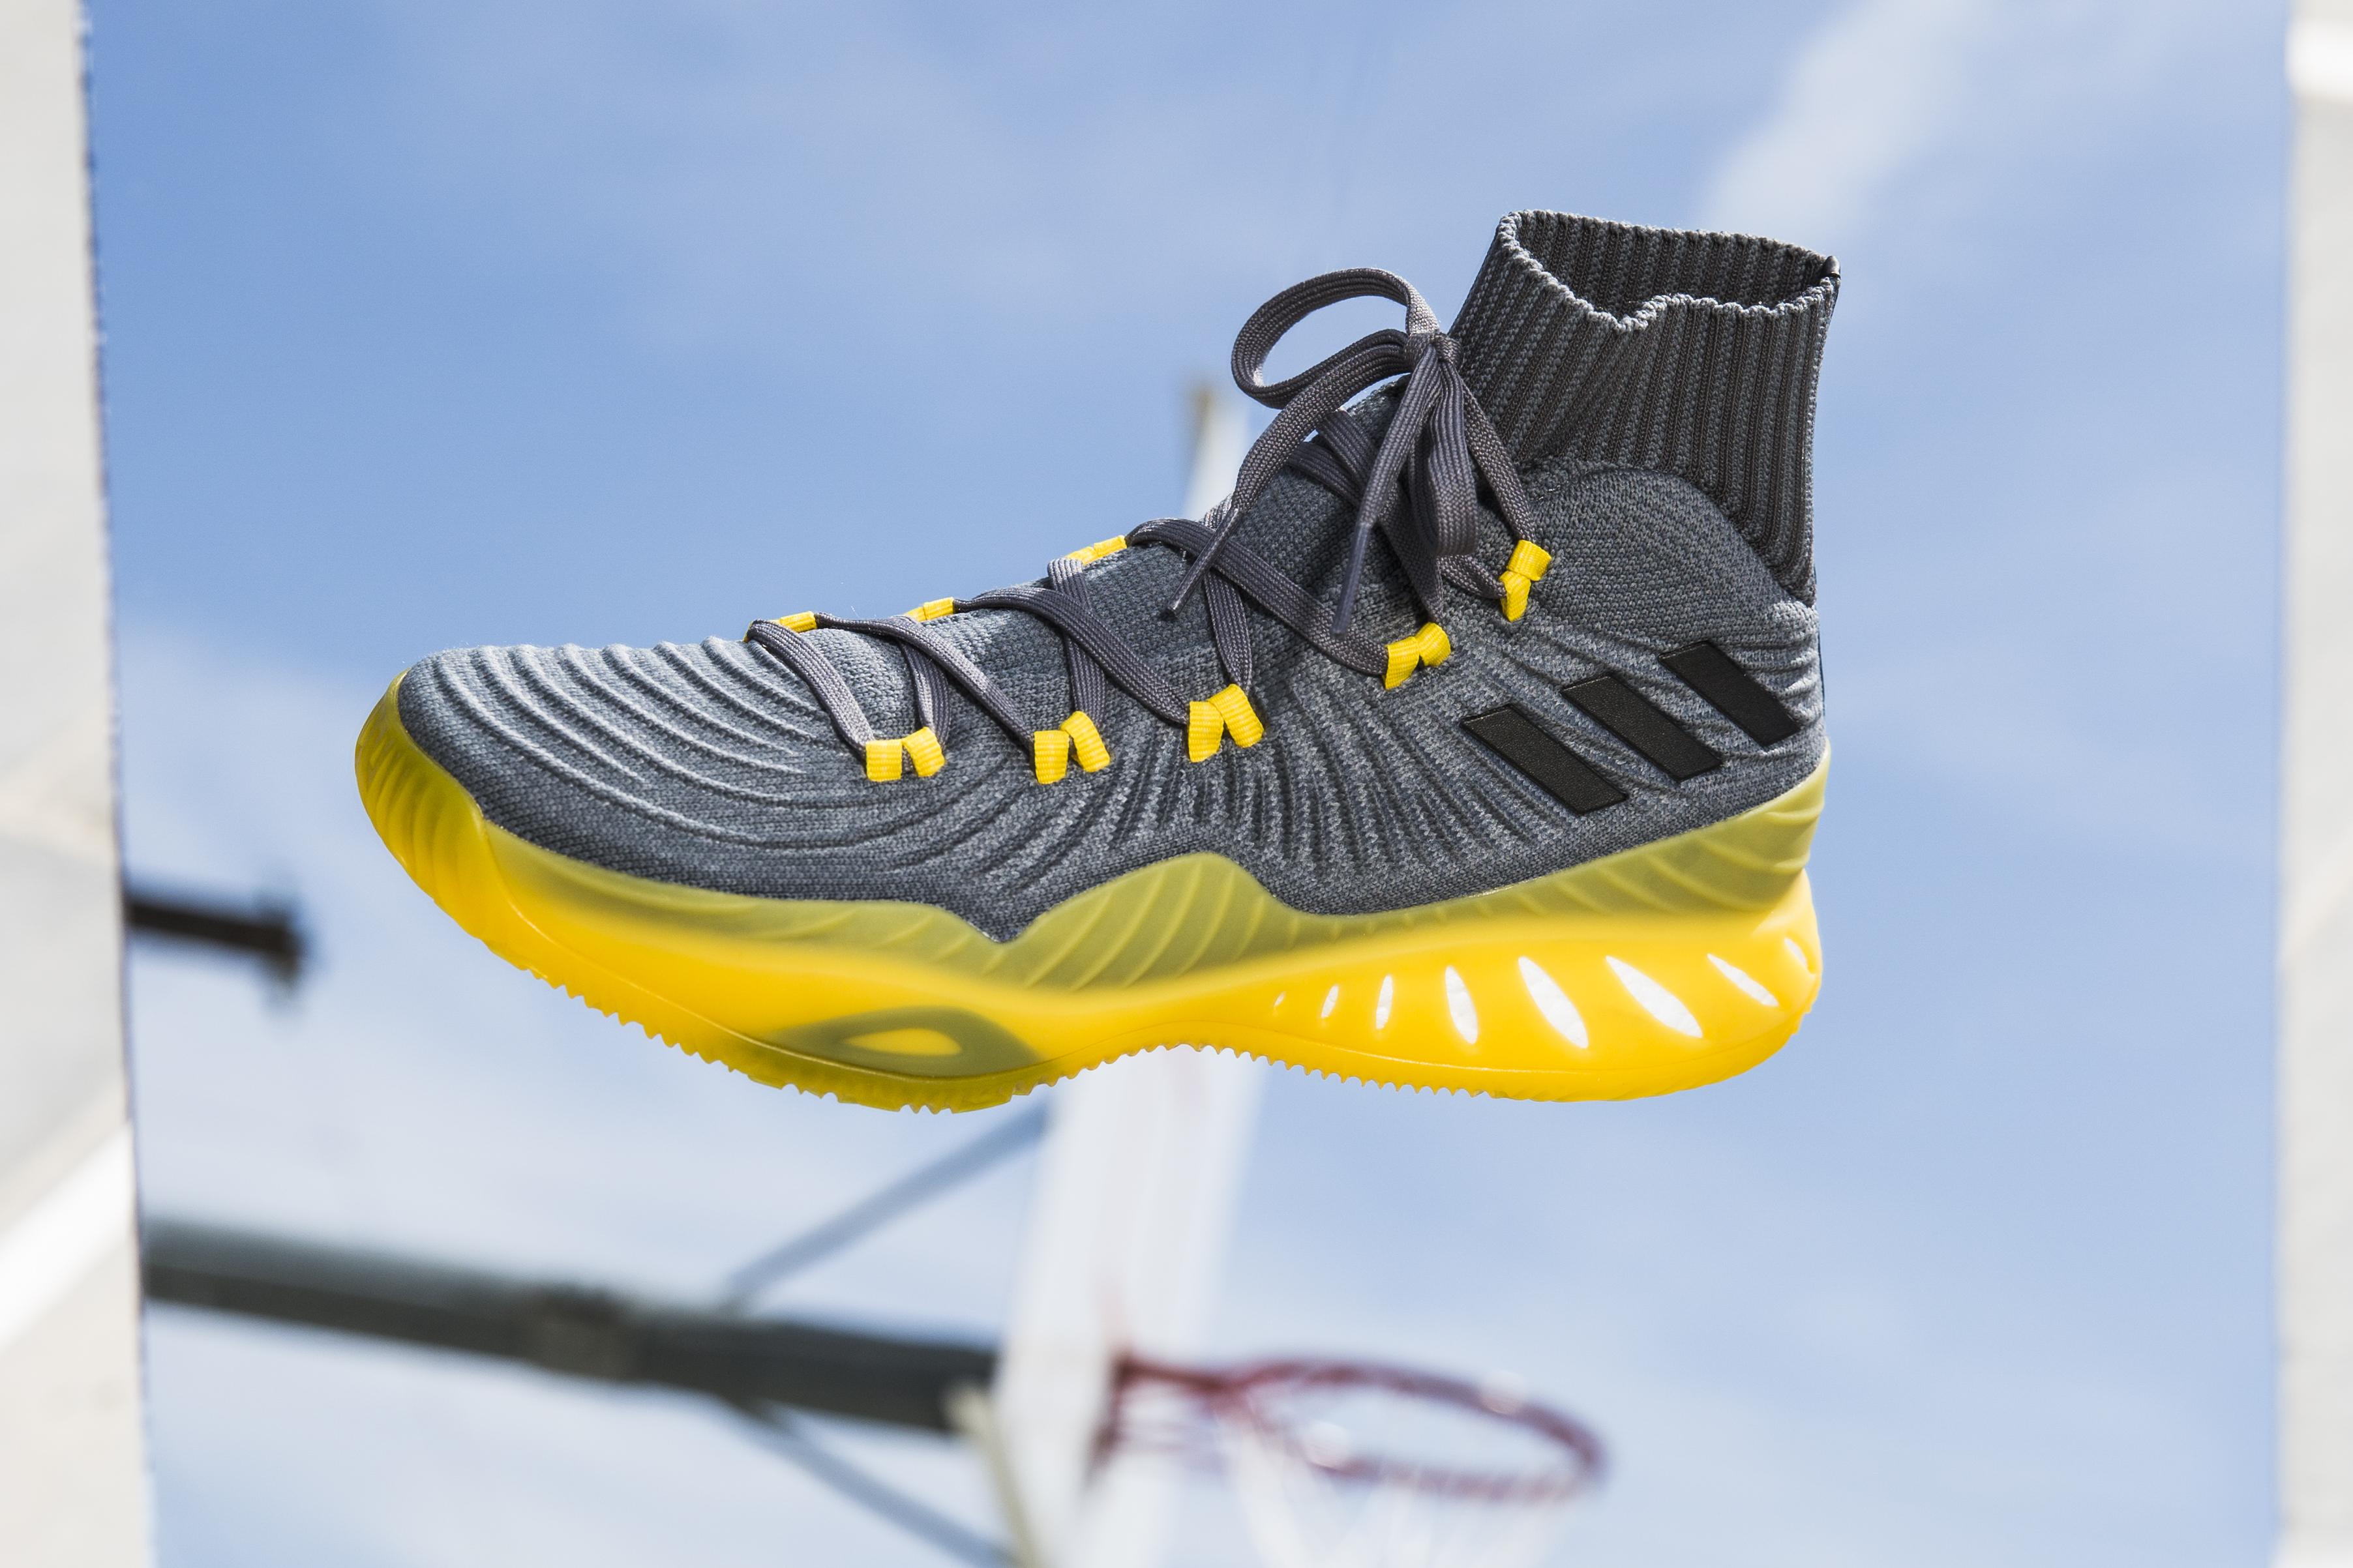 super popular 7fcab 9efc4 adidas announces release of Crazy Explosive 17 basketball sh